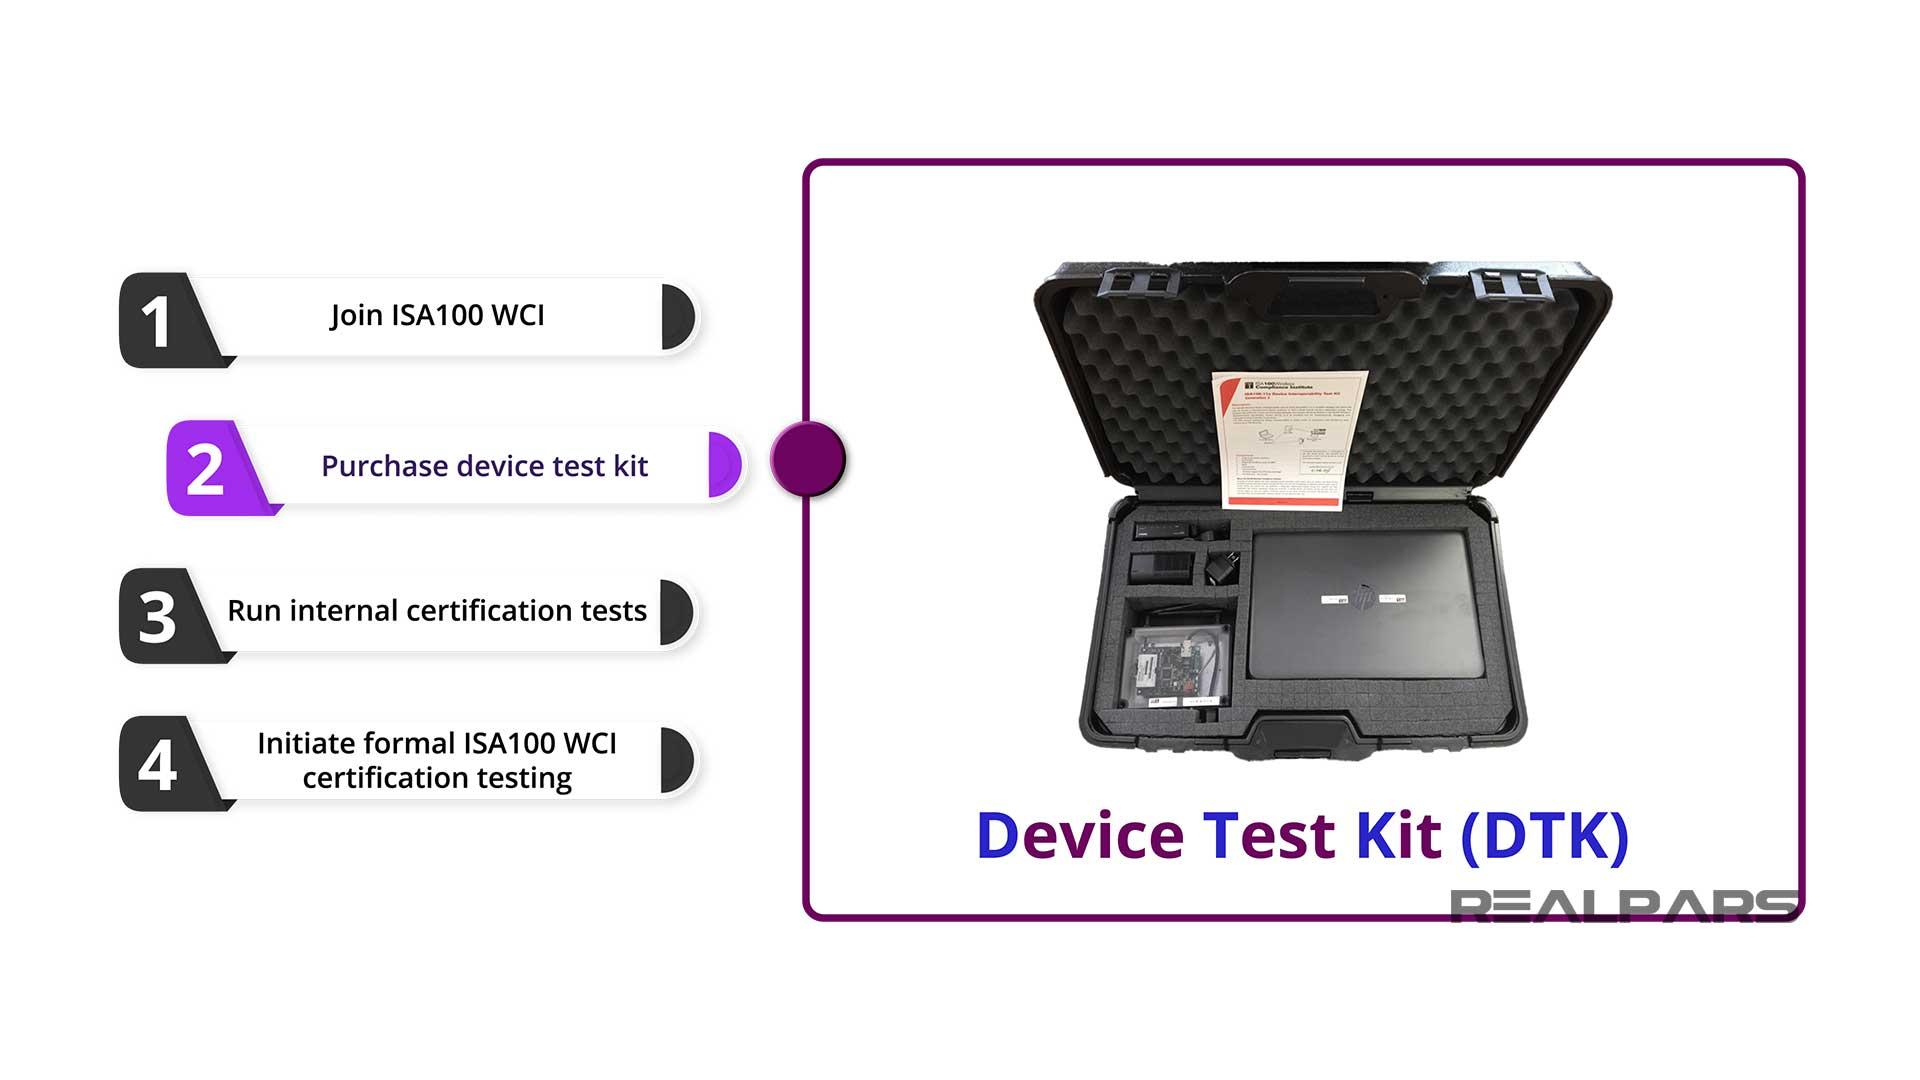 Device Test Kit